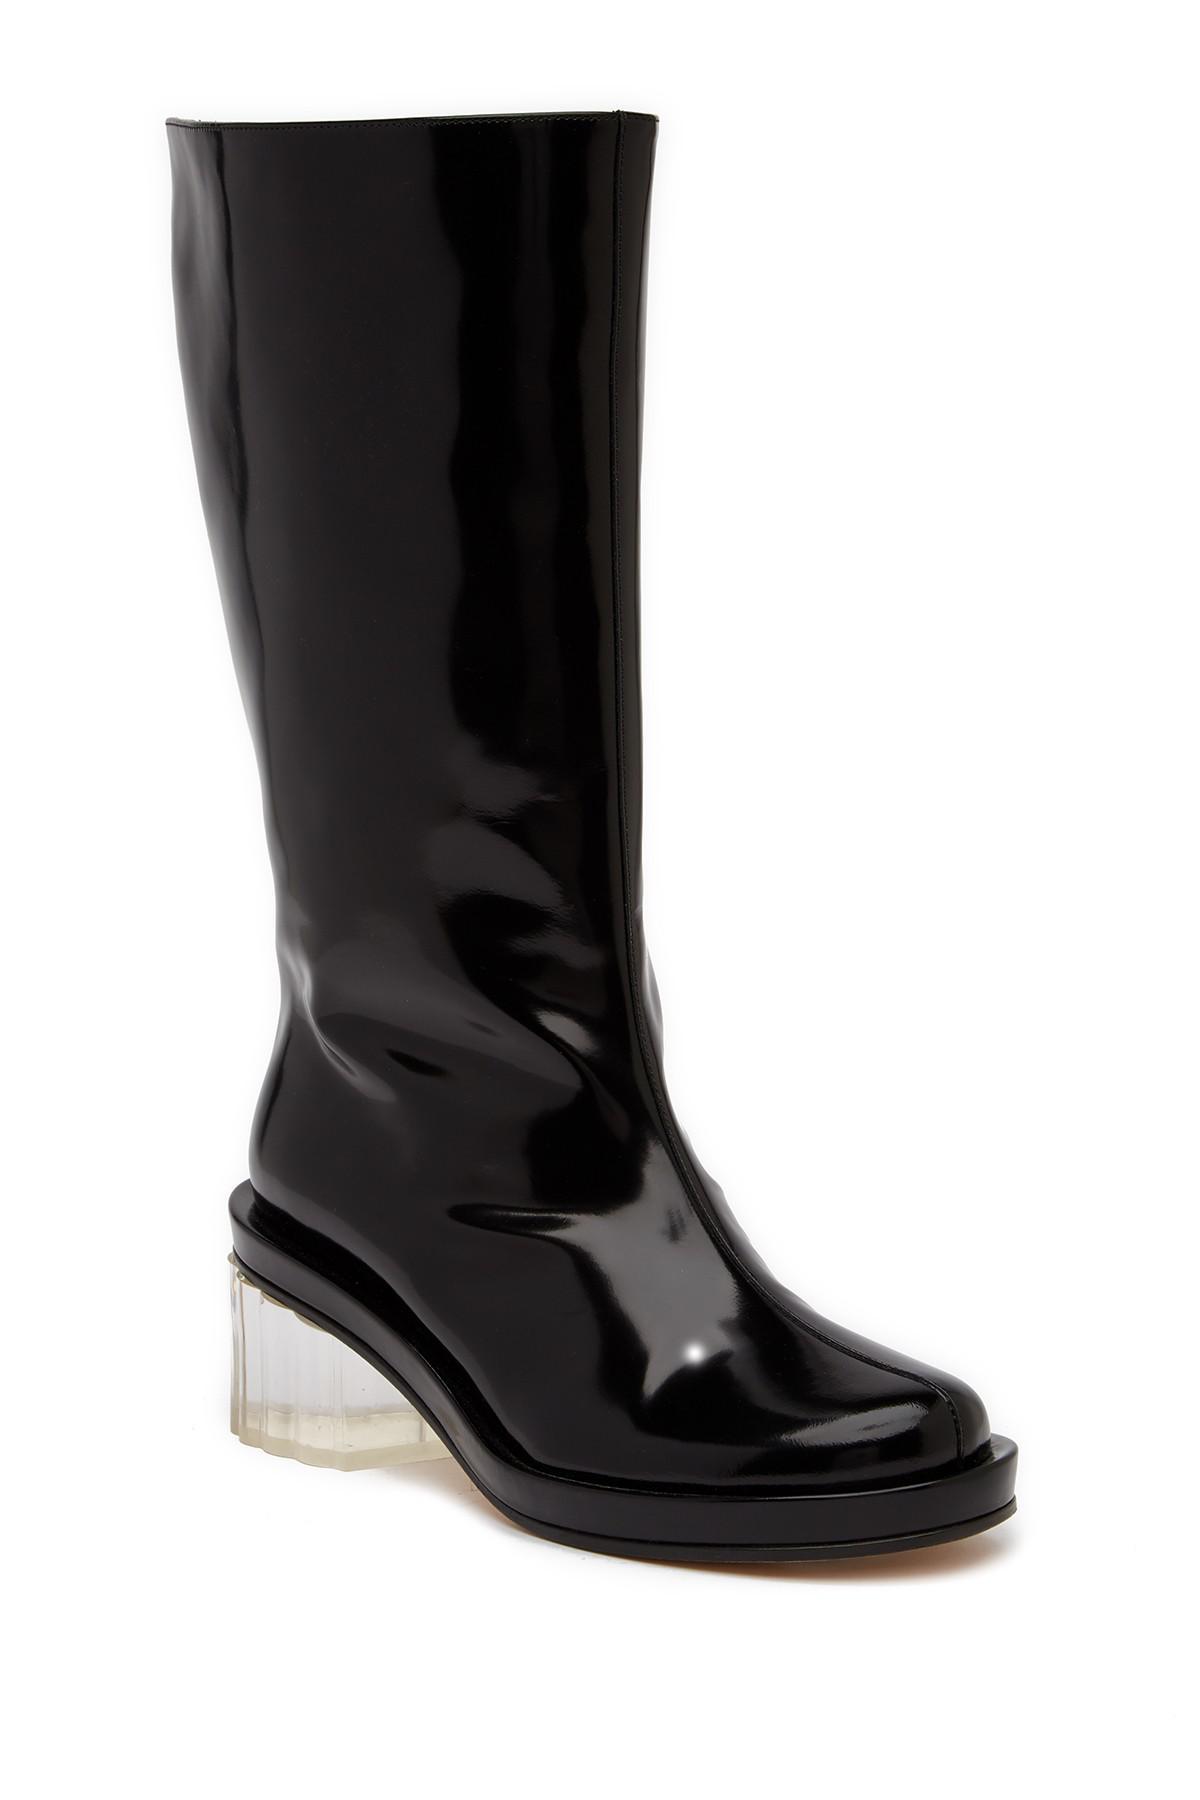 Simone Rocha Black Suede Glawdys Boots 99N0SknY